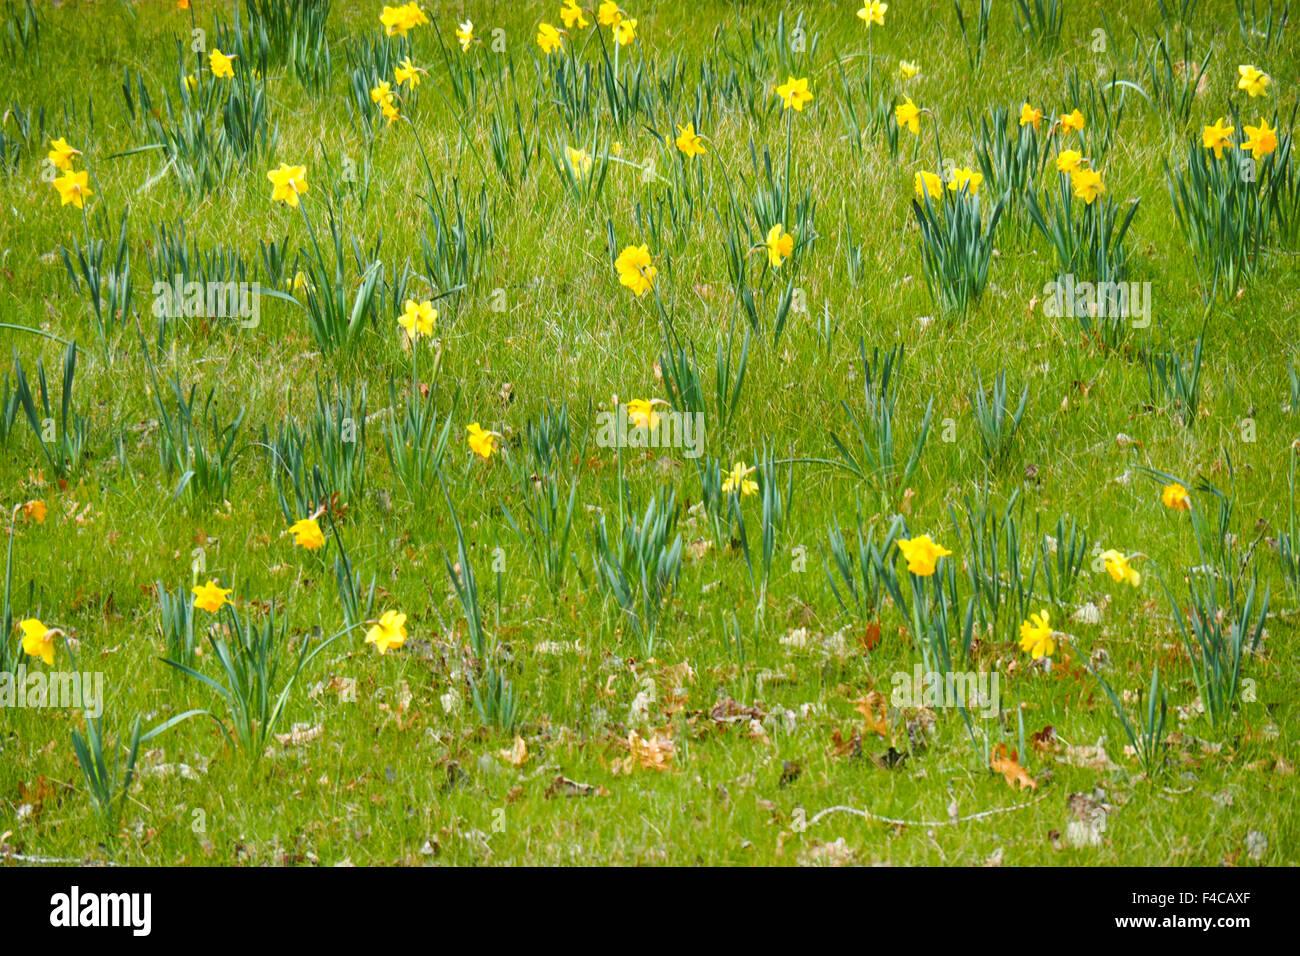 Yellow daffodils in the Mount Lofty Botanical garden. - Stock Image